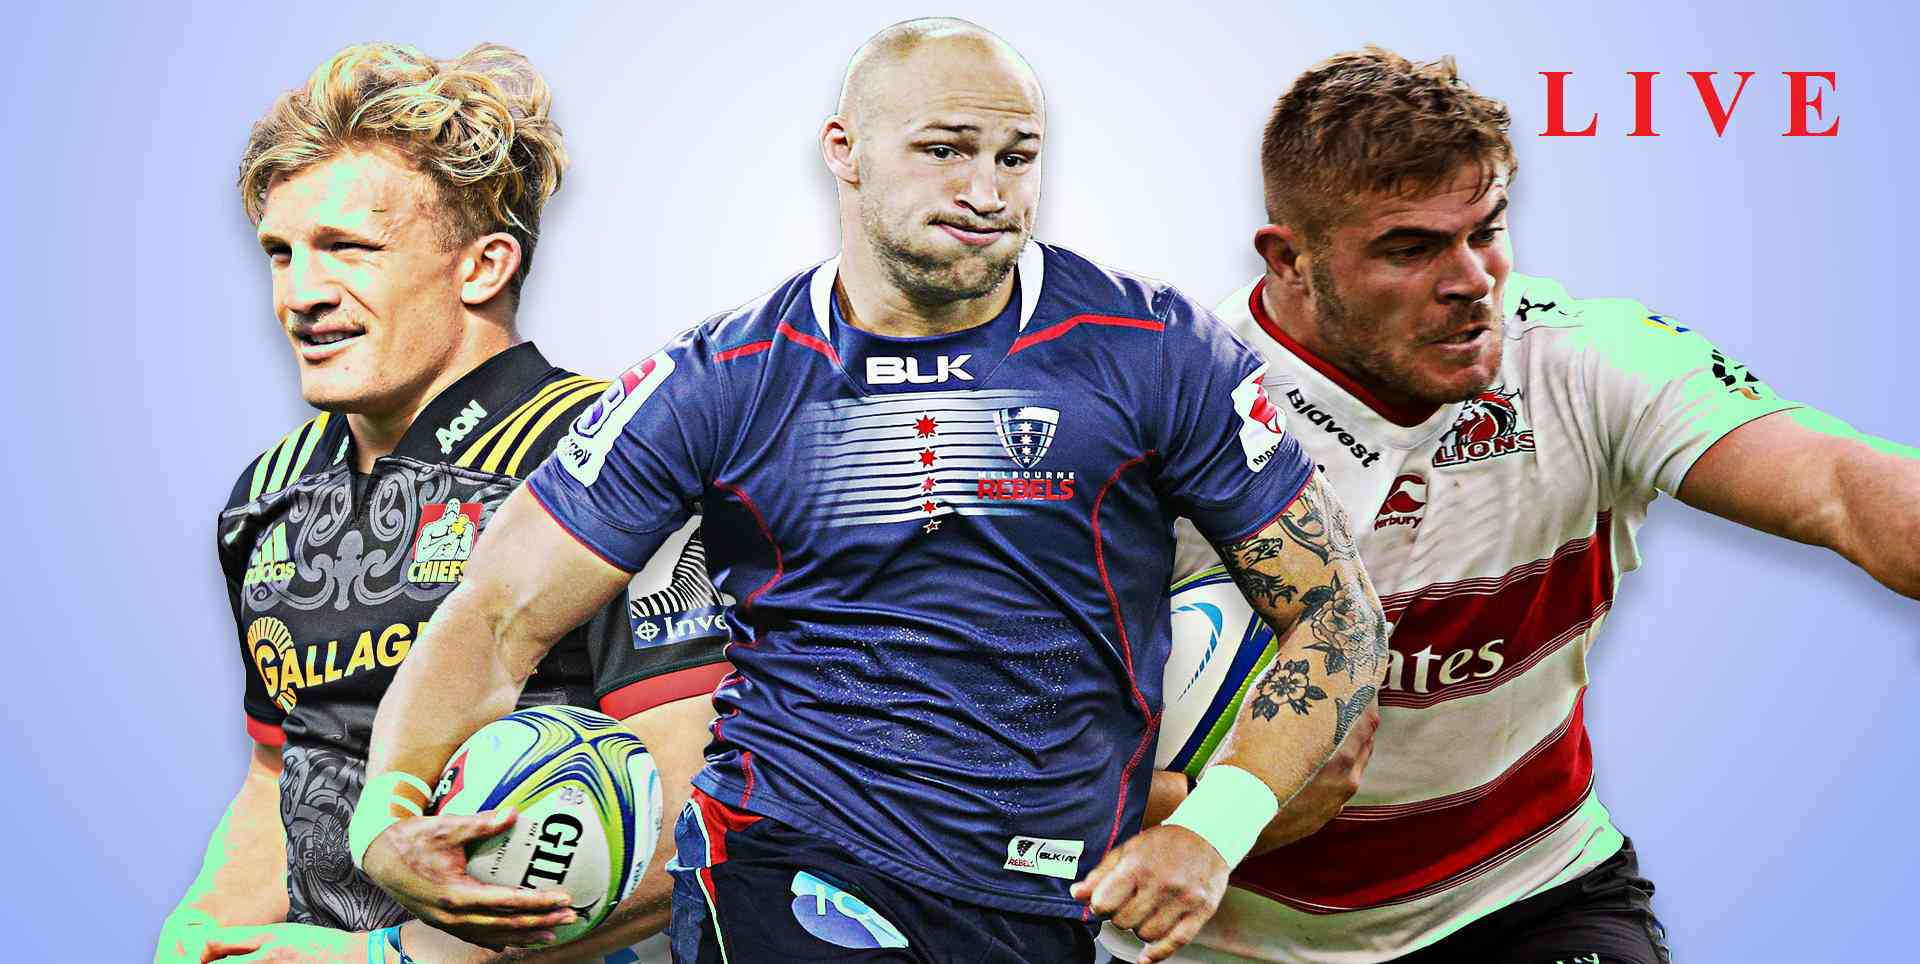 live-rugby-leicester-vs-munster-online